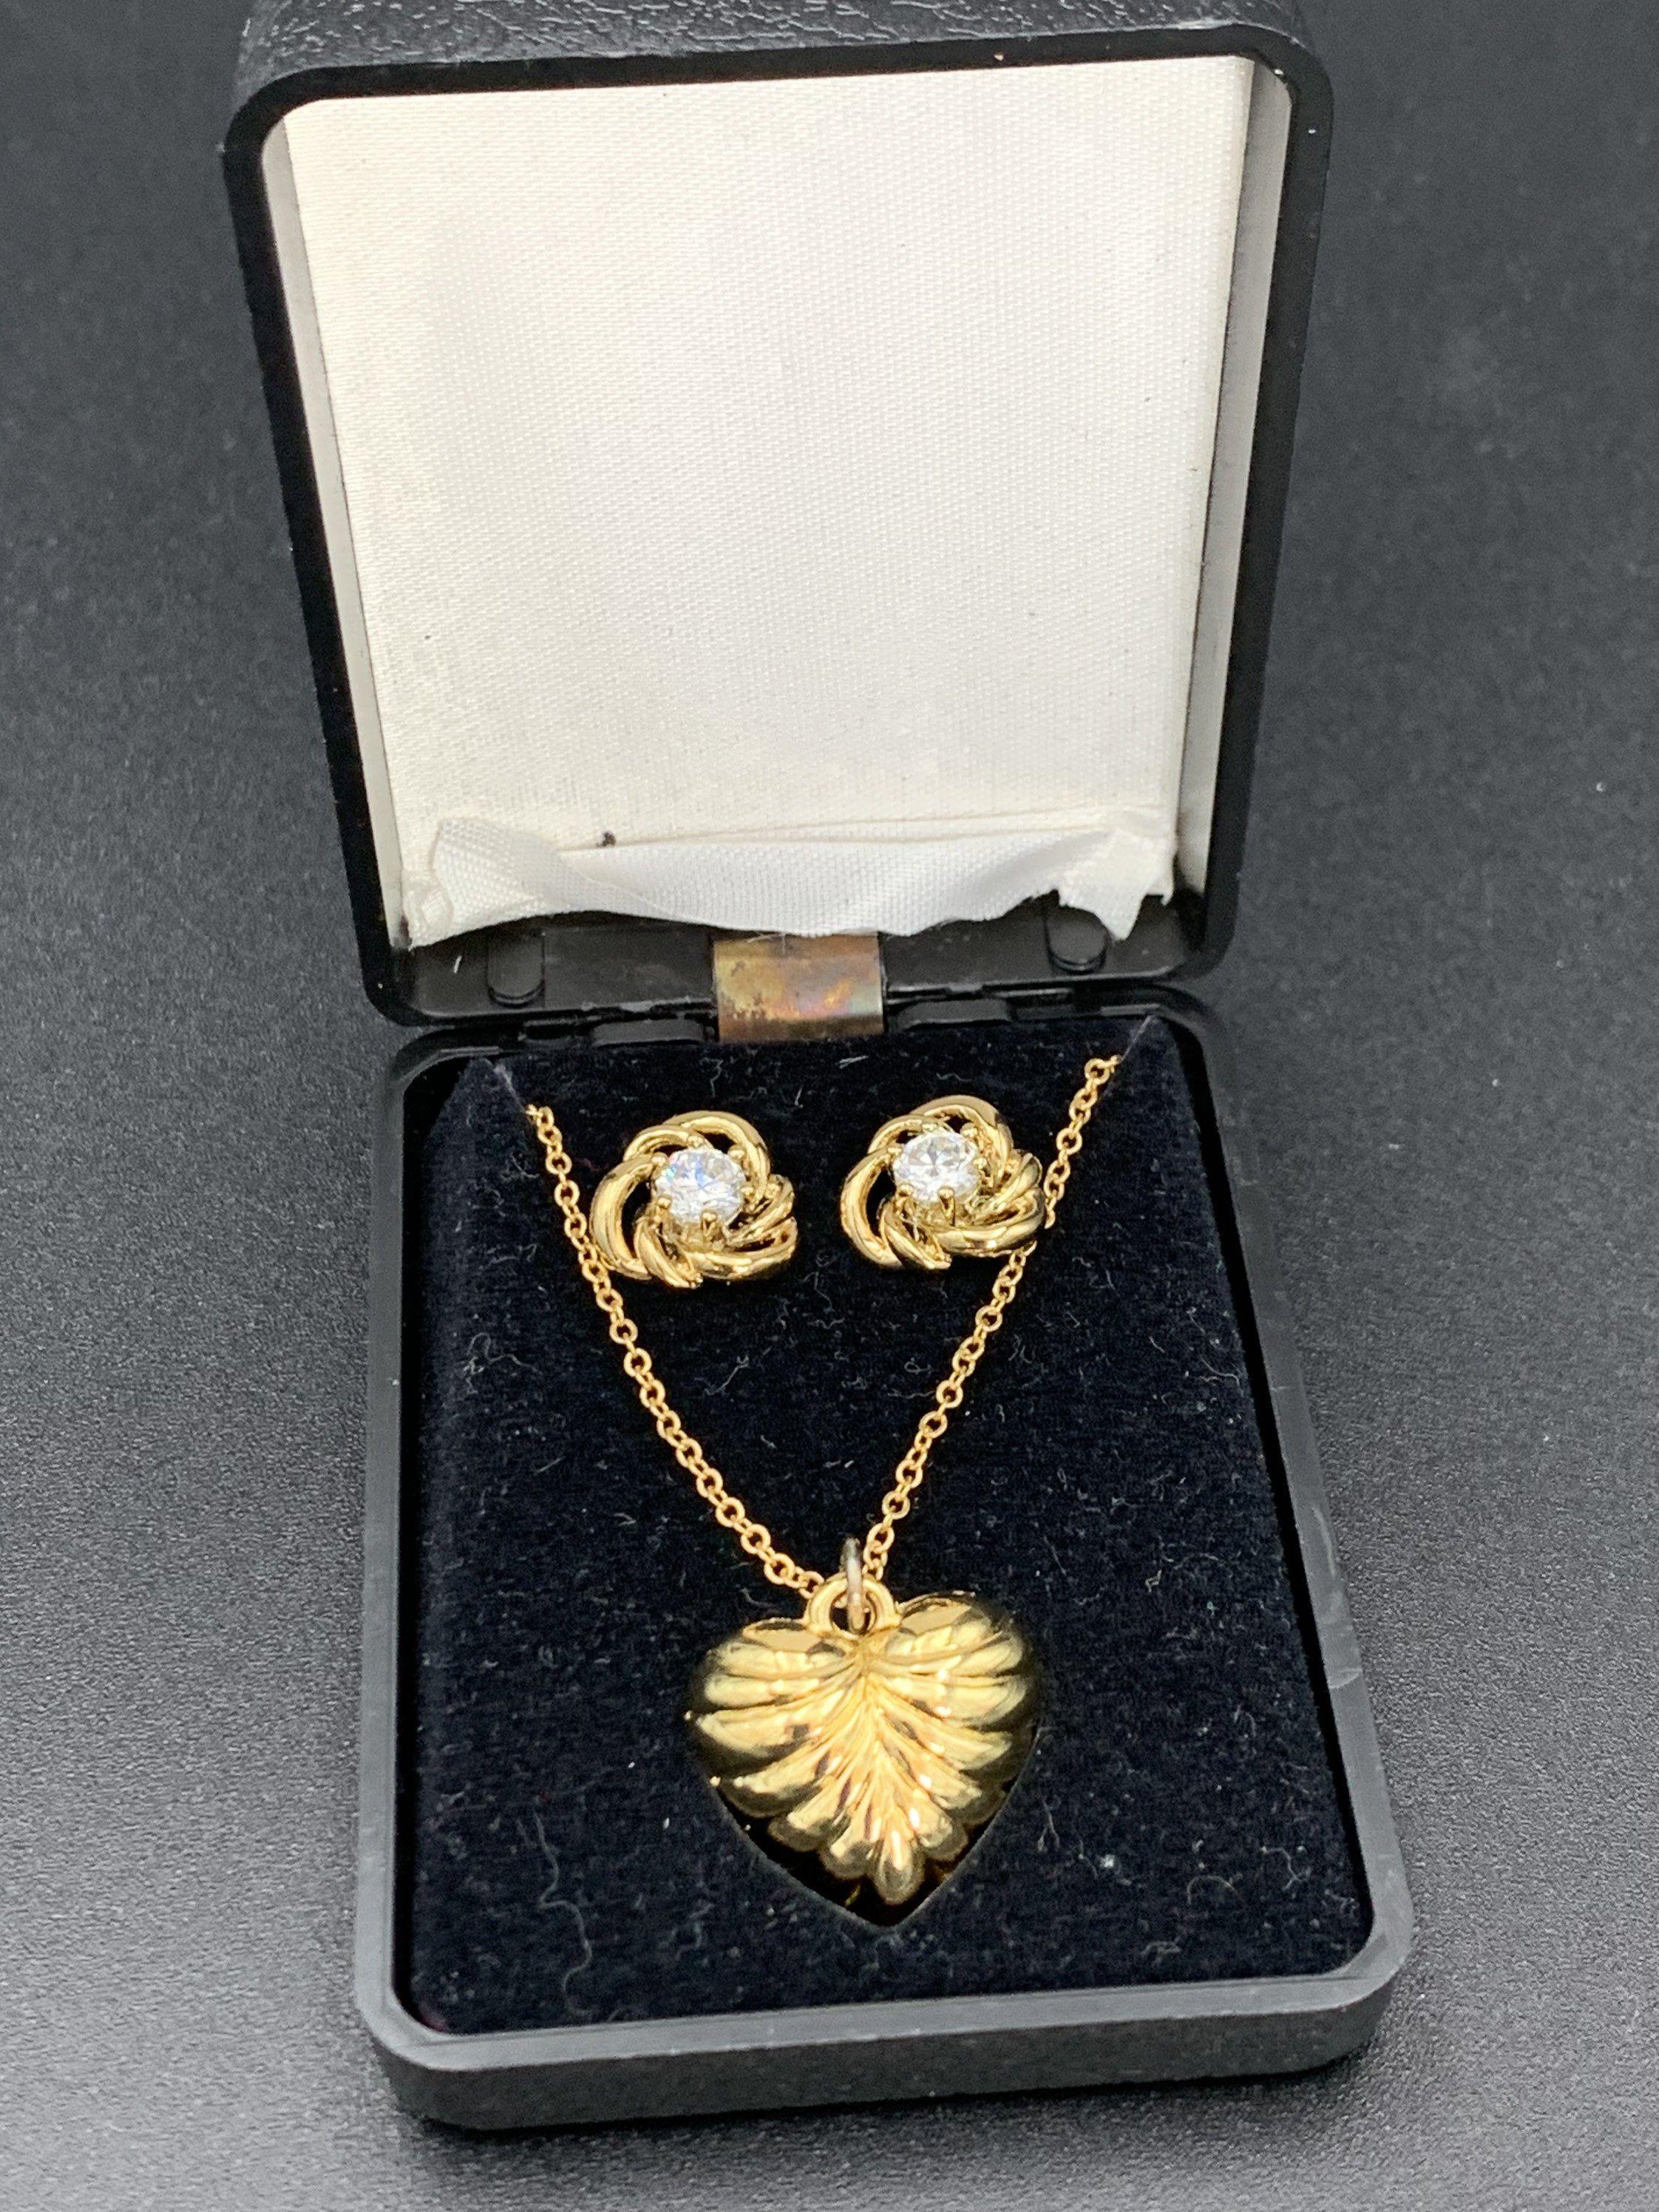 Jewelry Set Heart Necklace and Cubic Zirconia Earrings | Etsy in 2020 |  Vintage jewelry sets, Etsy earrings, Women jewelry